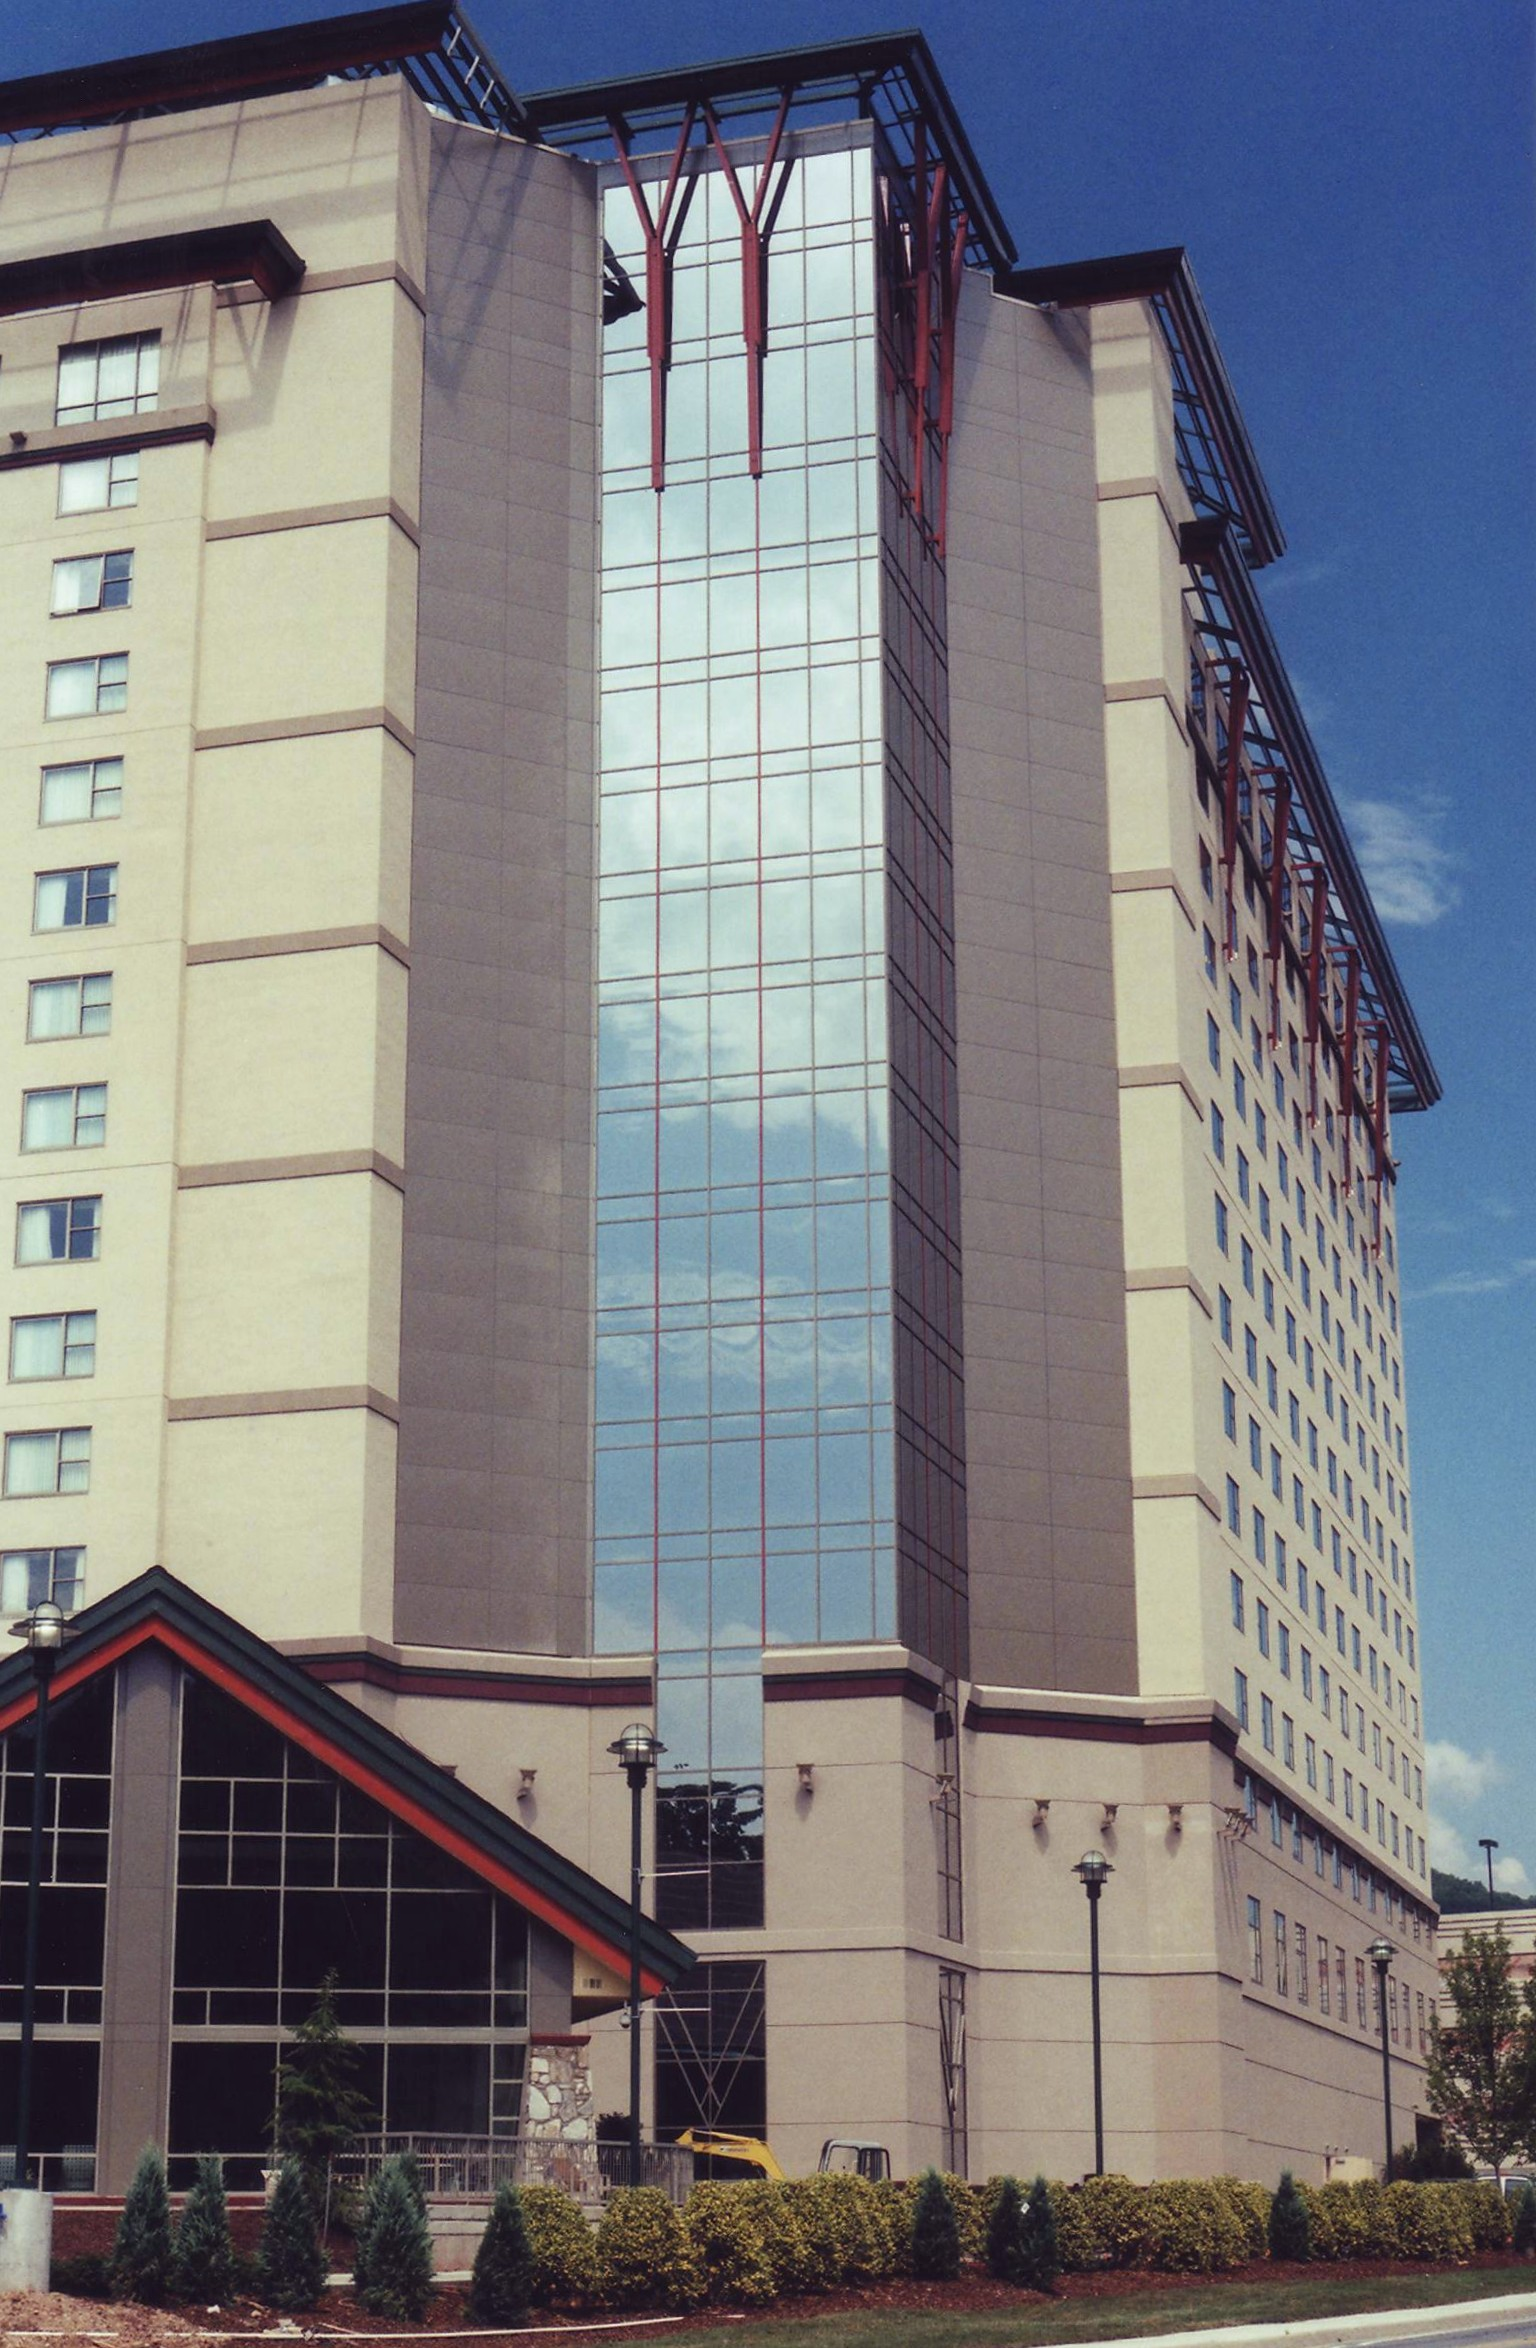 Harrah's Casino & Hotel - Cherokee, NC - Built in 2002 - 15 Stories - Modernism Style - Hotel Casino Use